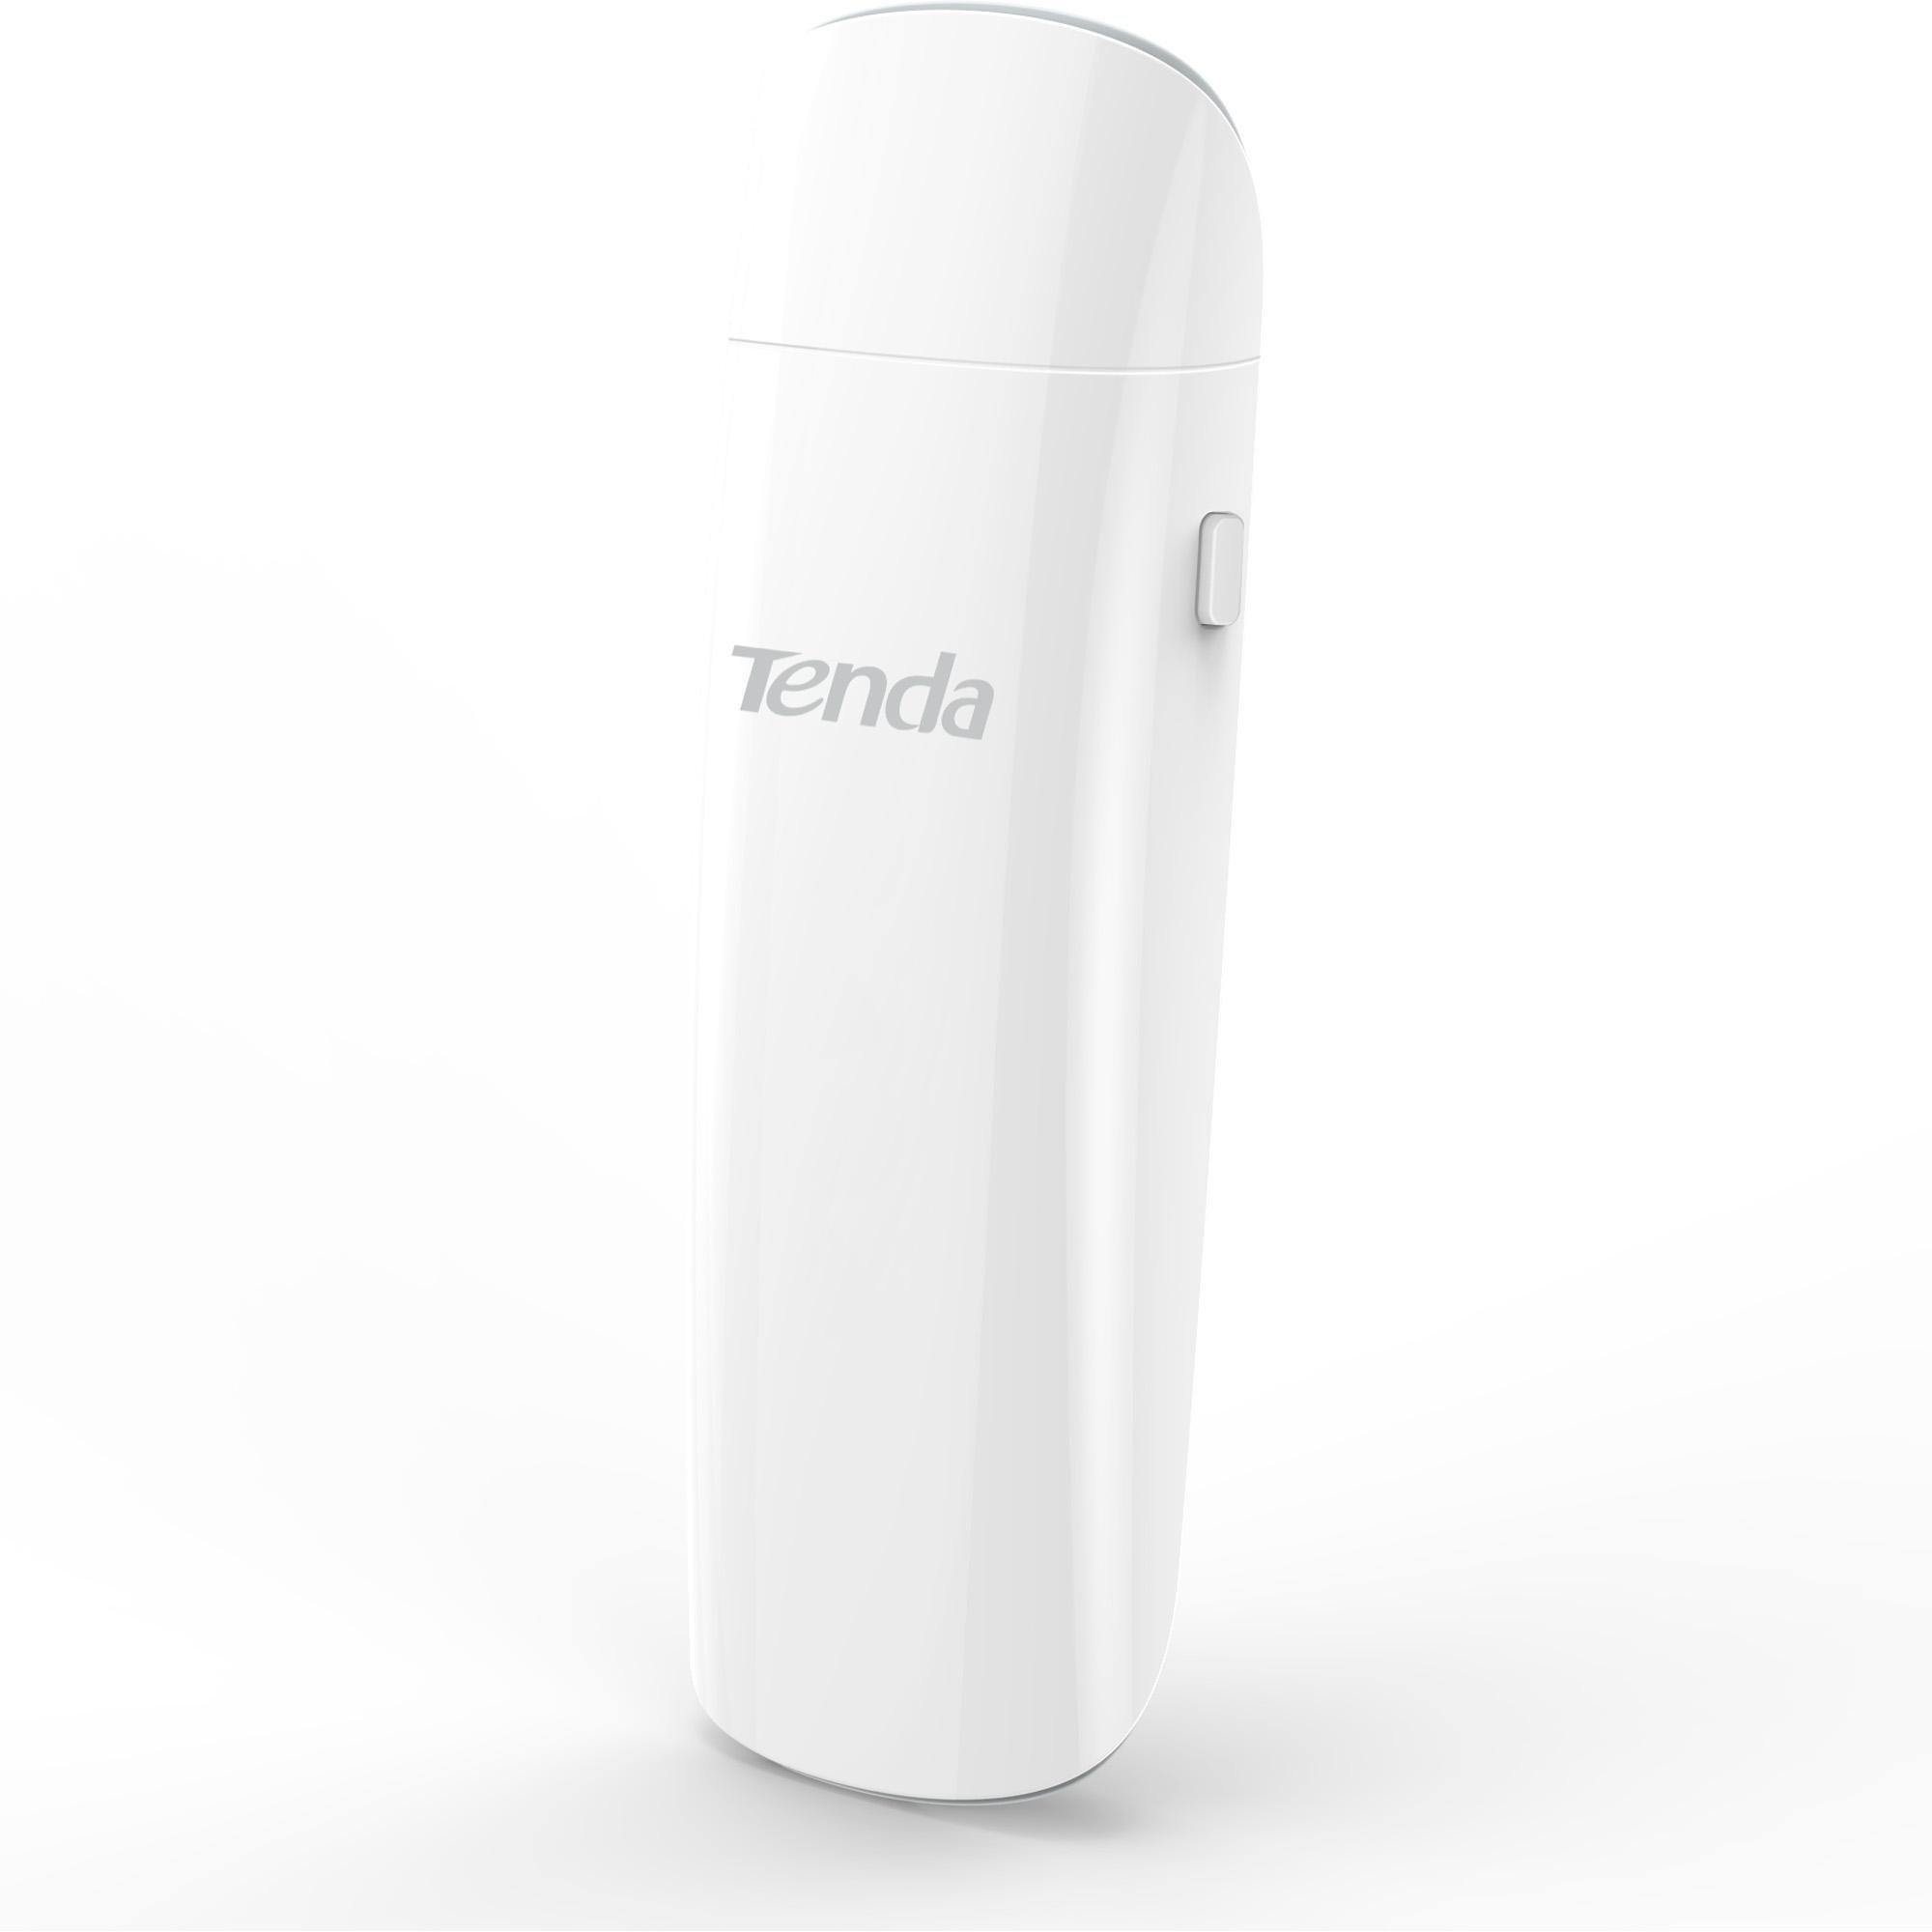 Adaptador Wireless USB 400MPBS U12 TENDA